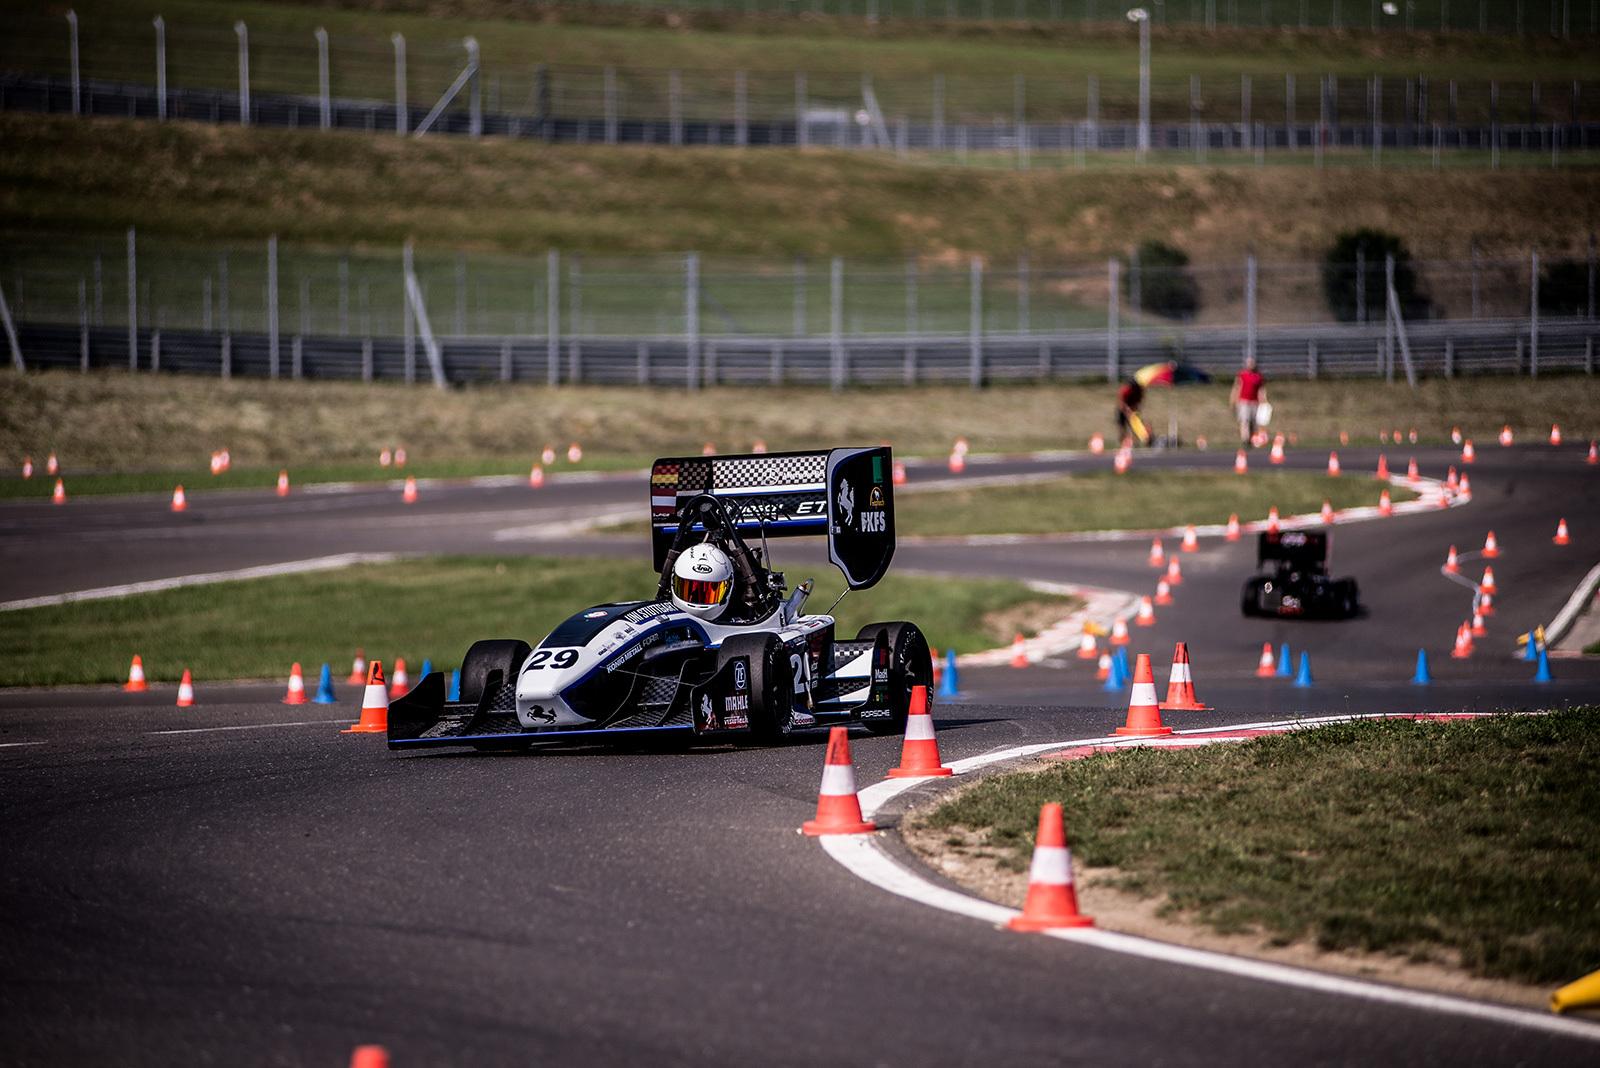 Epreuve de l'endurance lors des Formula Student